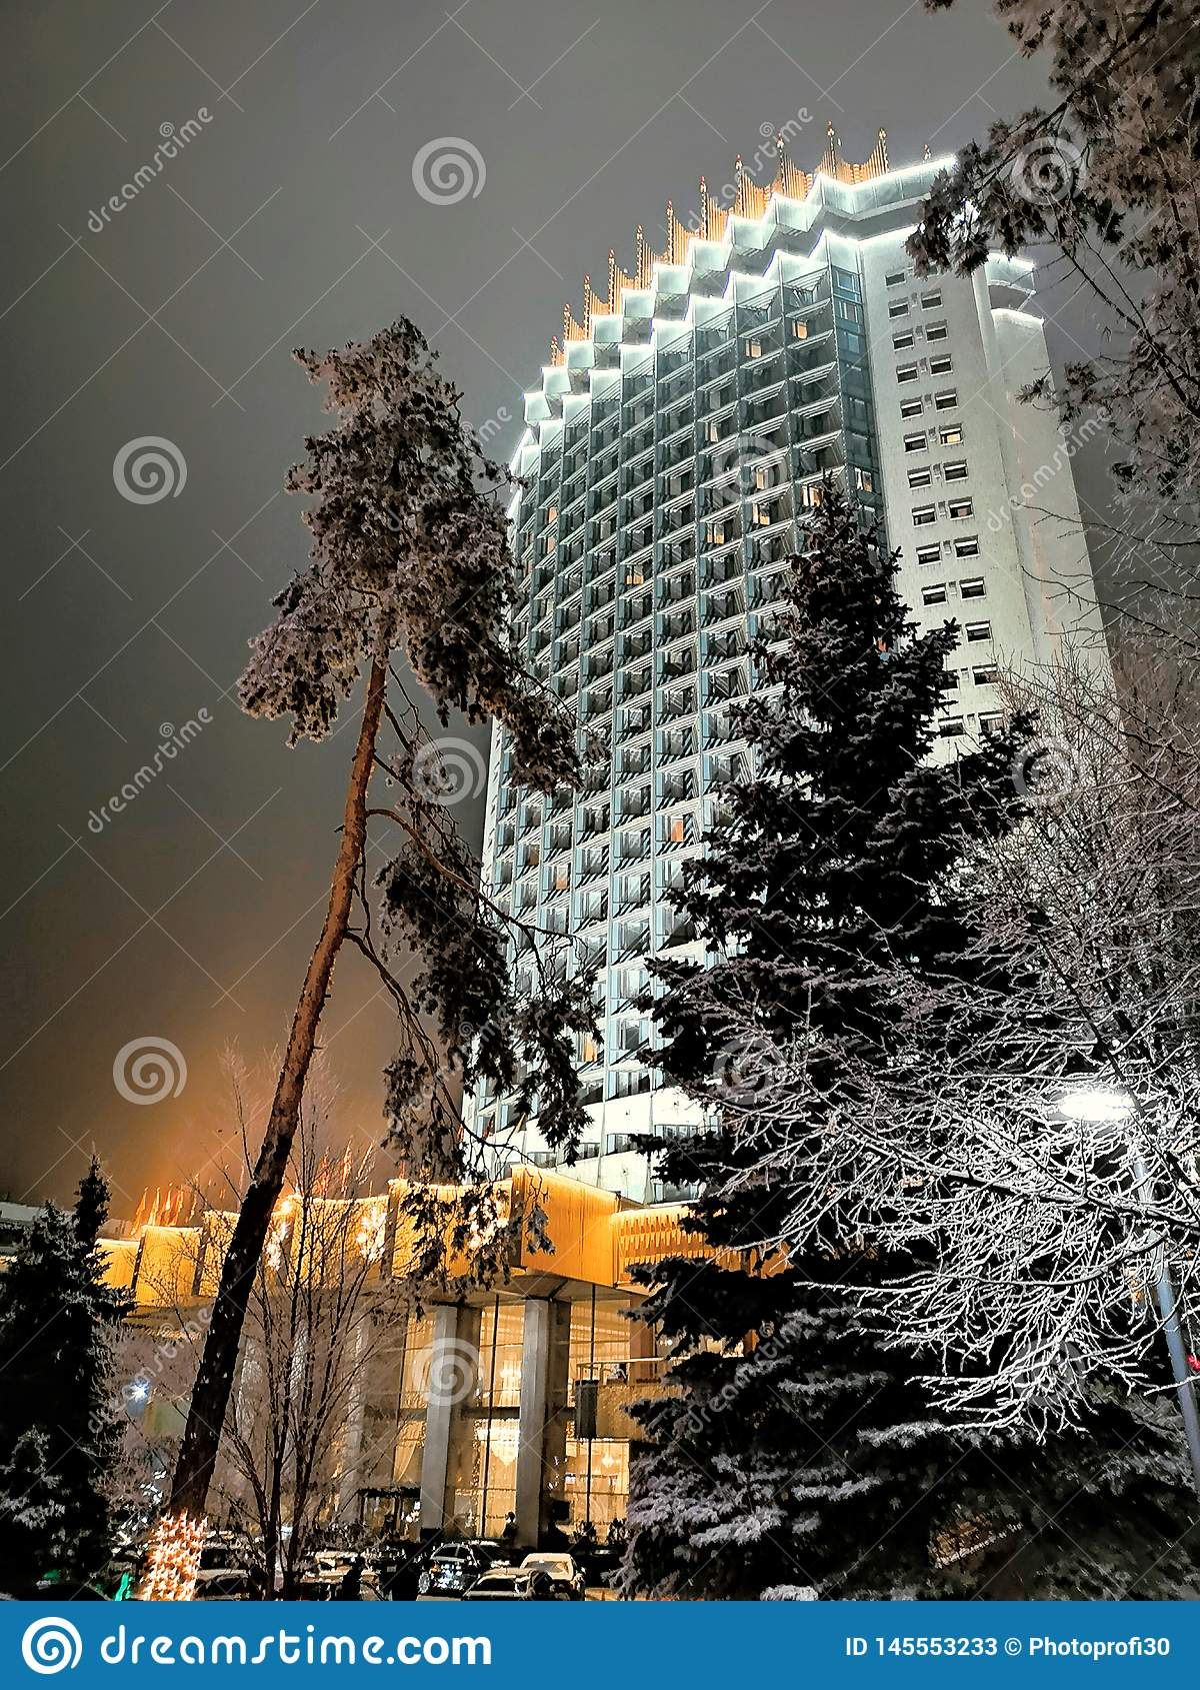 Kazachstan hotel w Almaty, Kazachstan